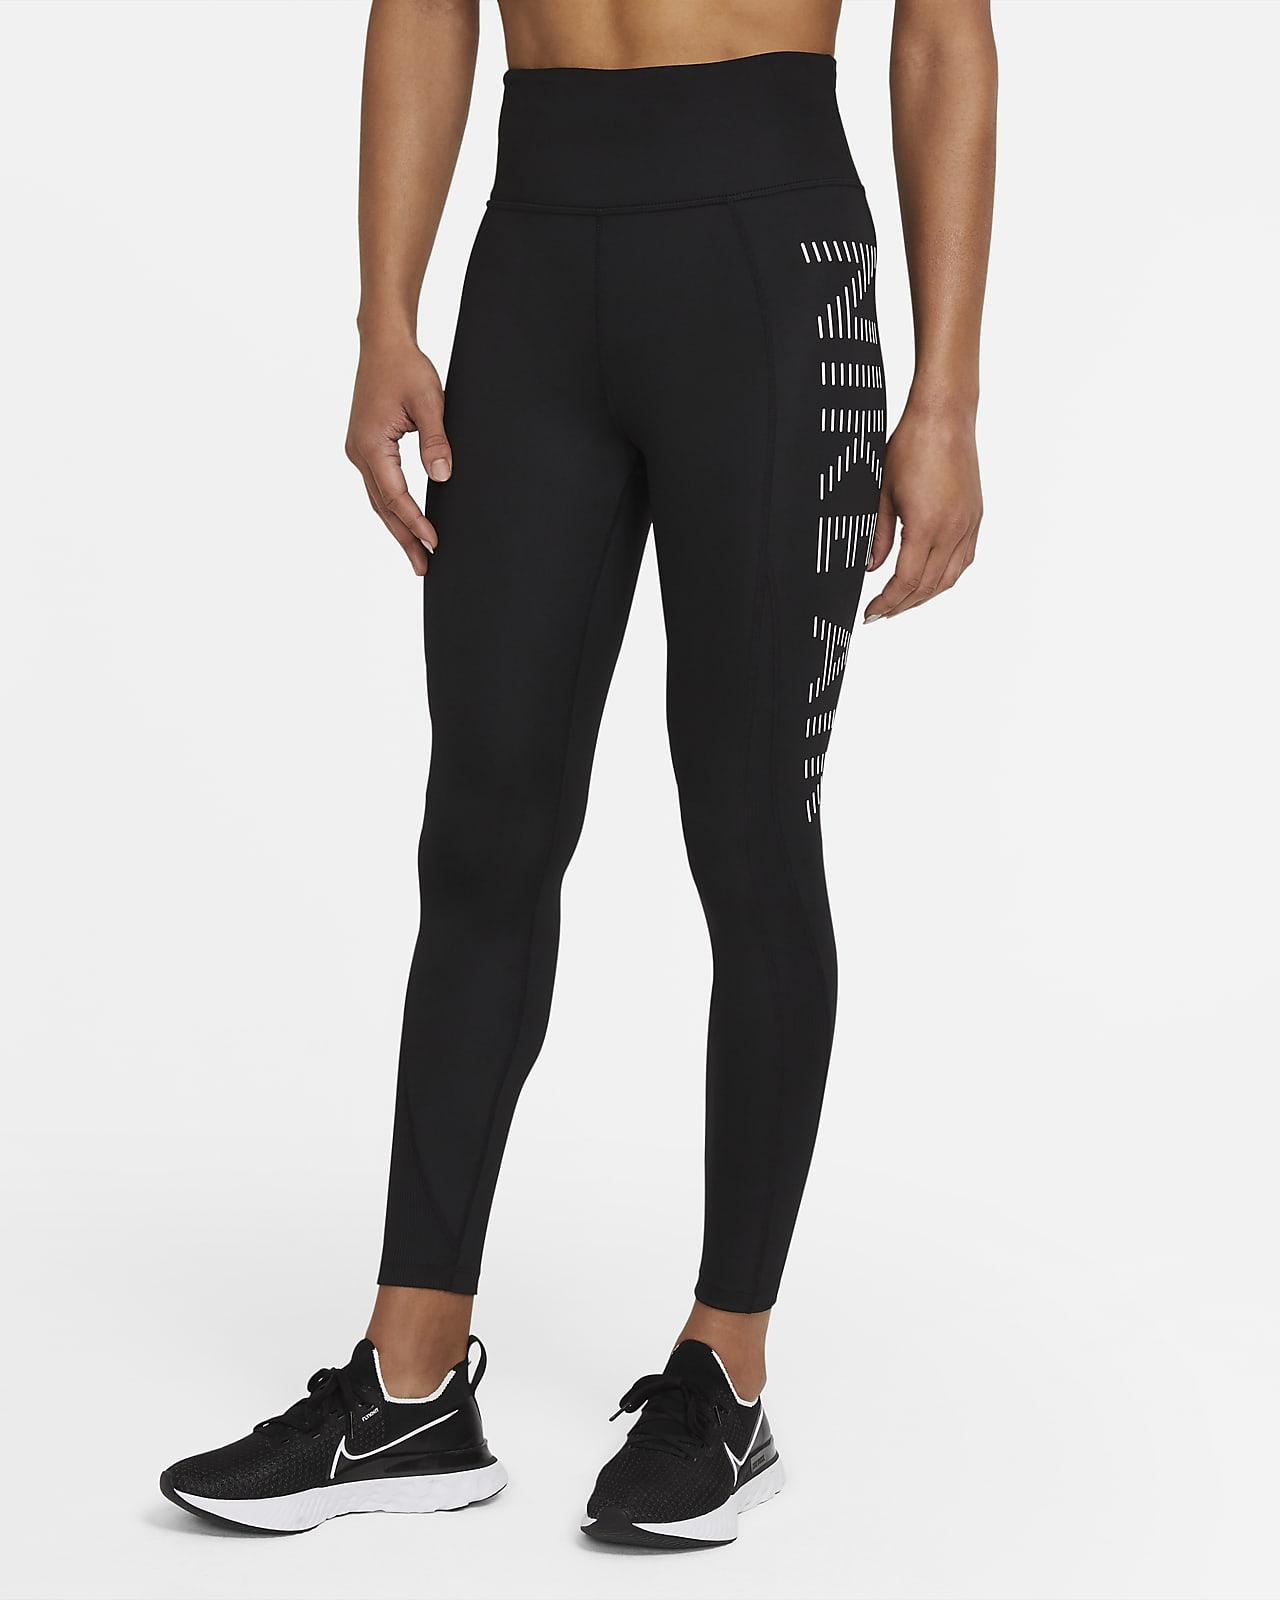 Legging de running 7/8 Nike Air Epic Fast pour Femme